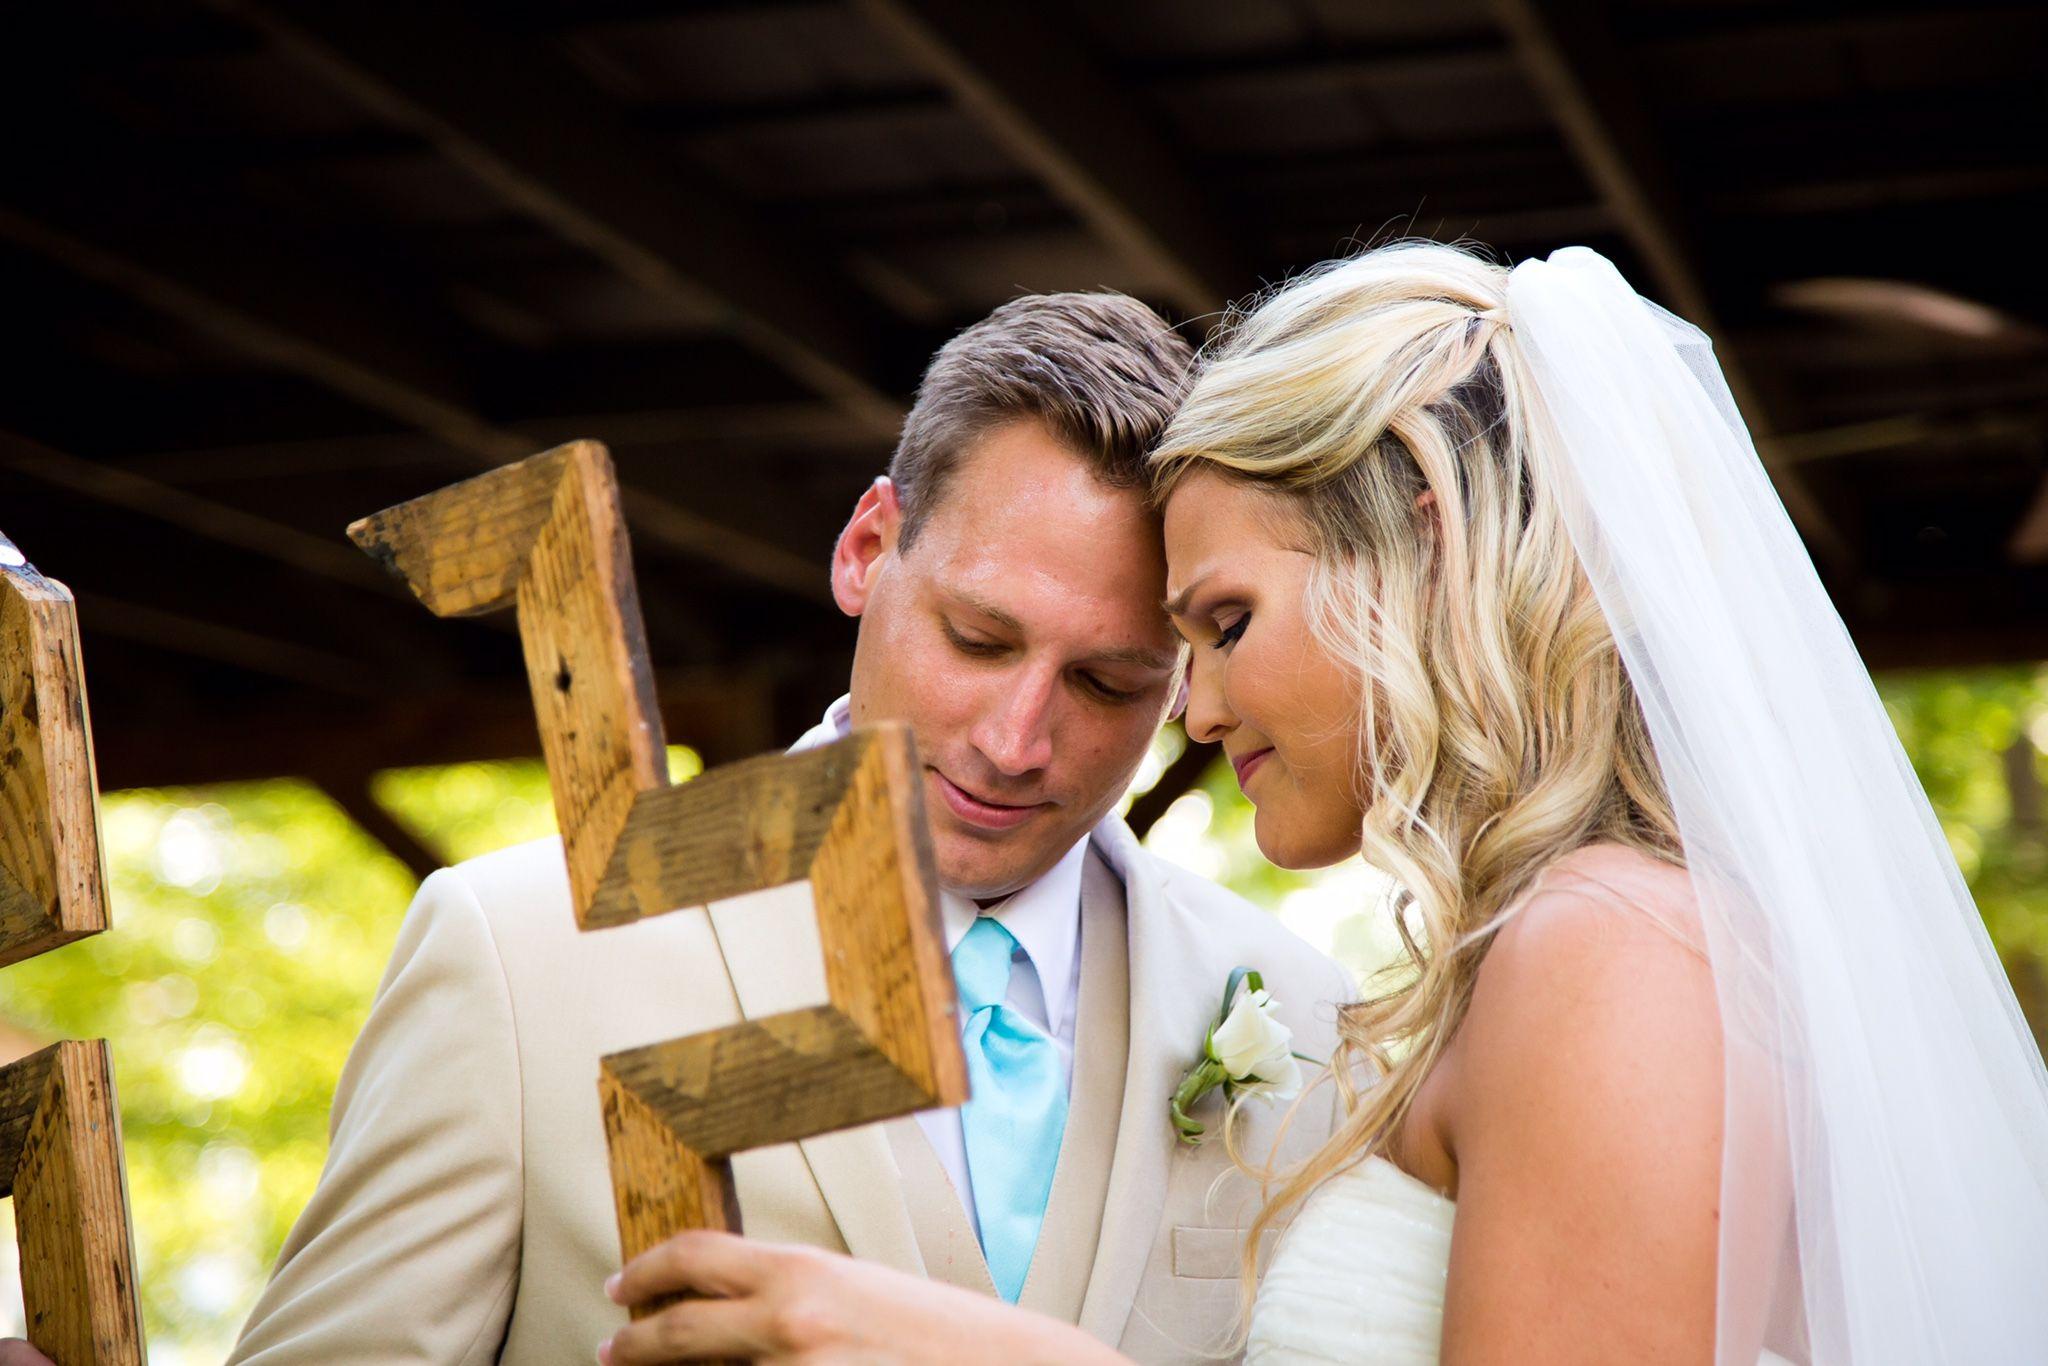 Unity cross. Wedding unity ceremony. nontraditional and